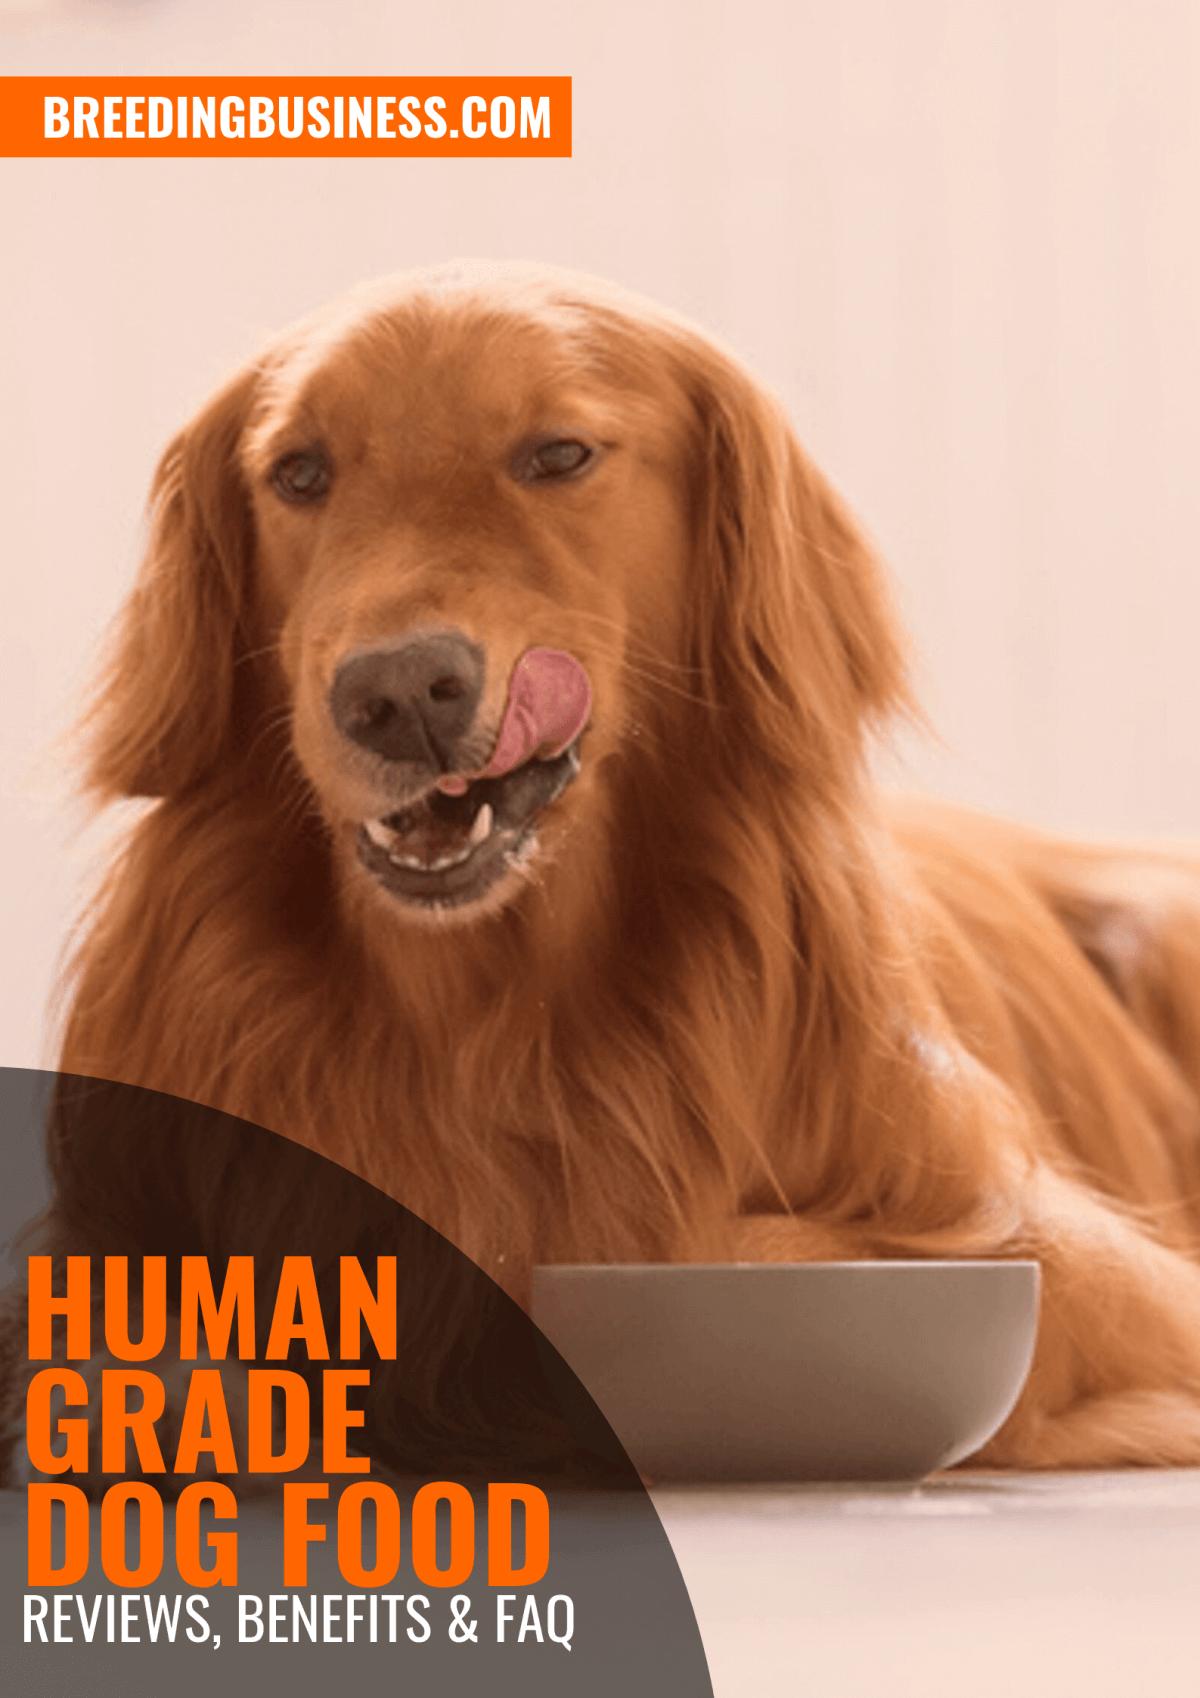 Human Grade Dog Foods – Reviews, Benefits & FAQ